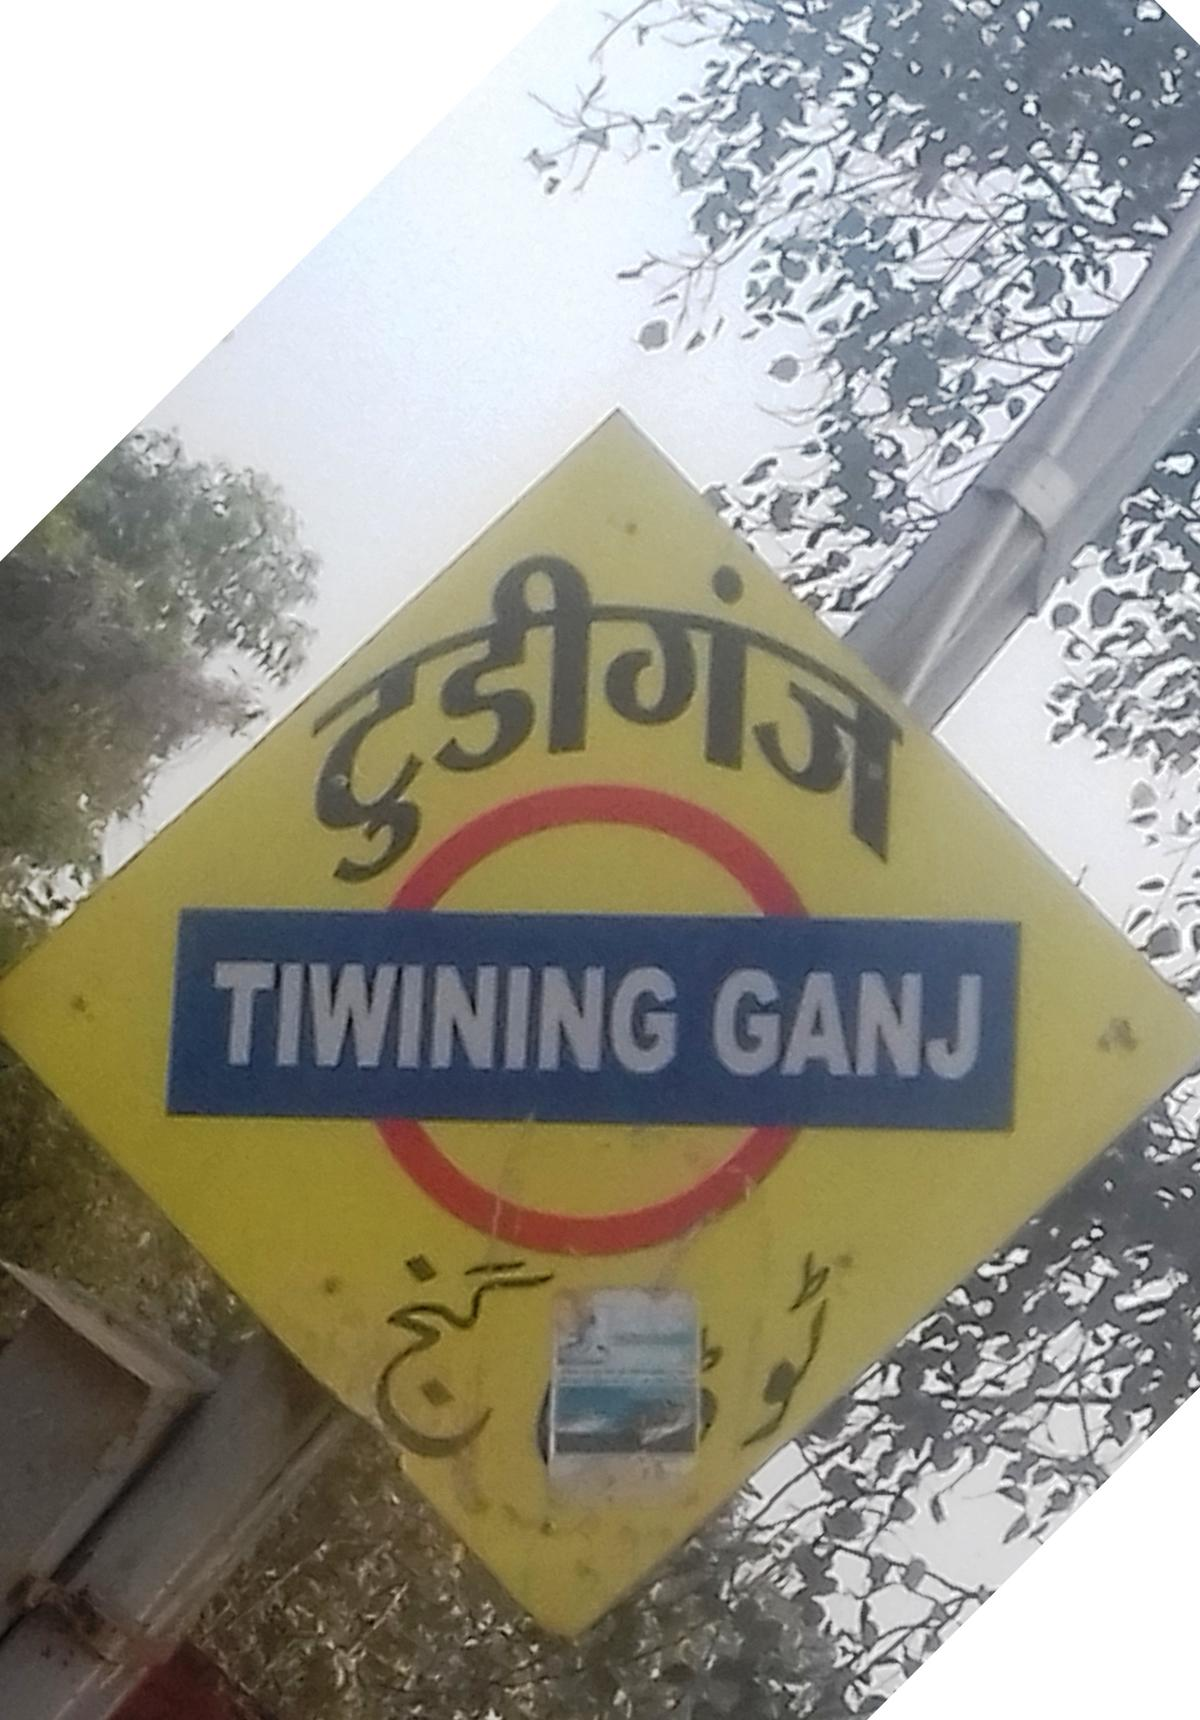 Twining Ganj Railway Station Map/Atlas ECR/East Central Zone